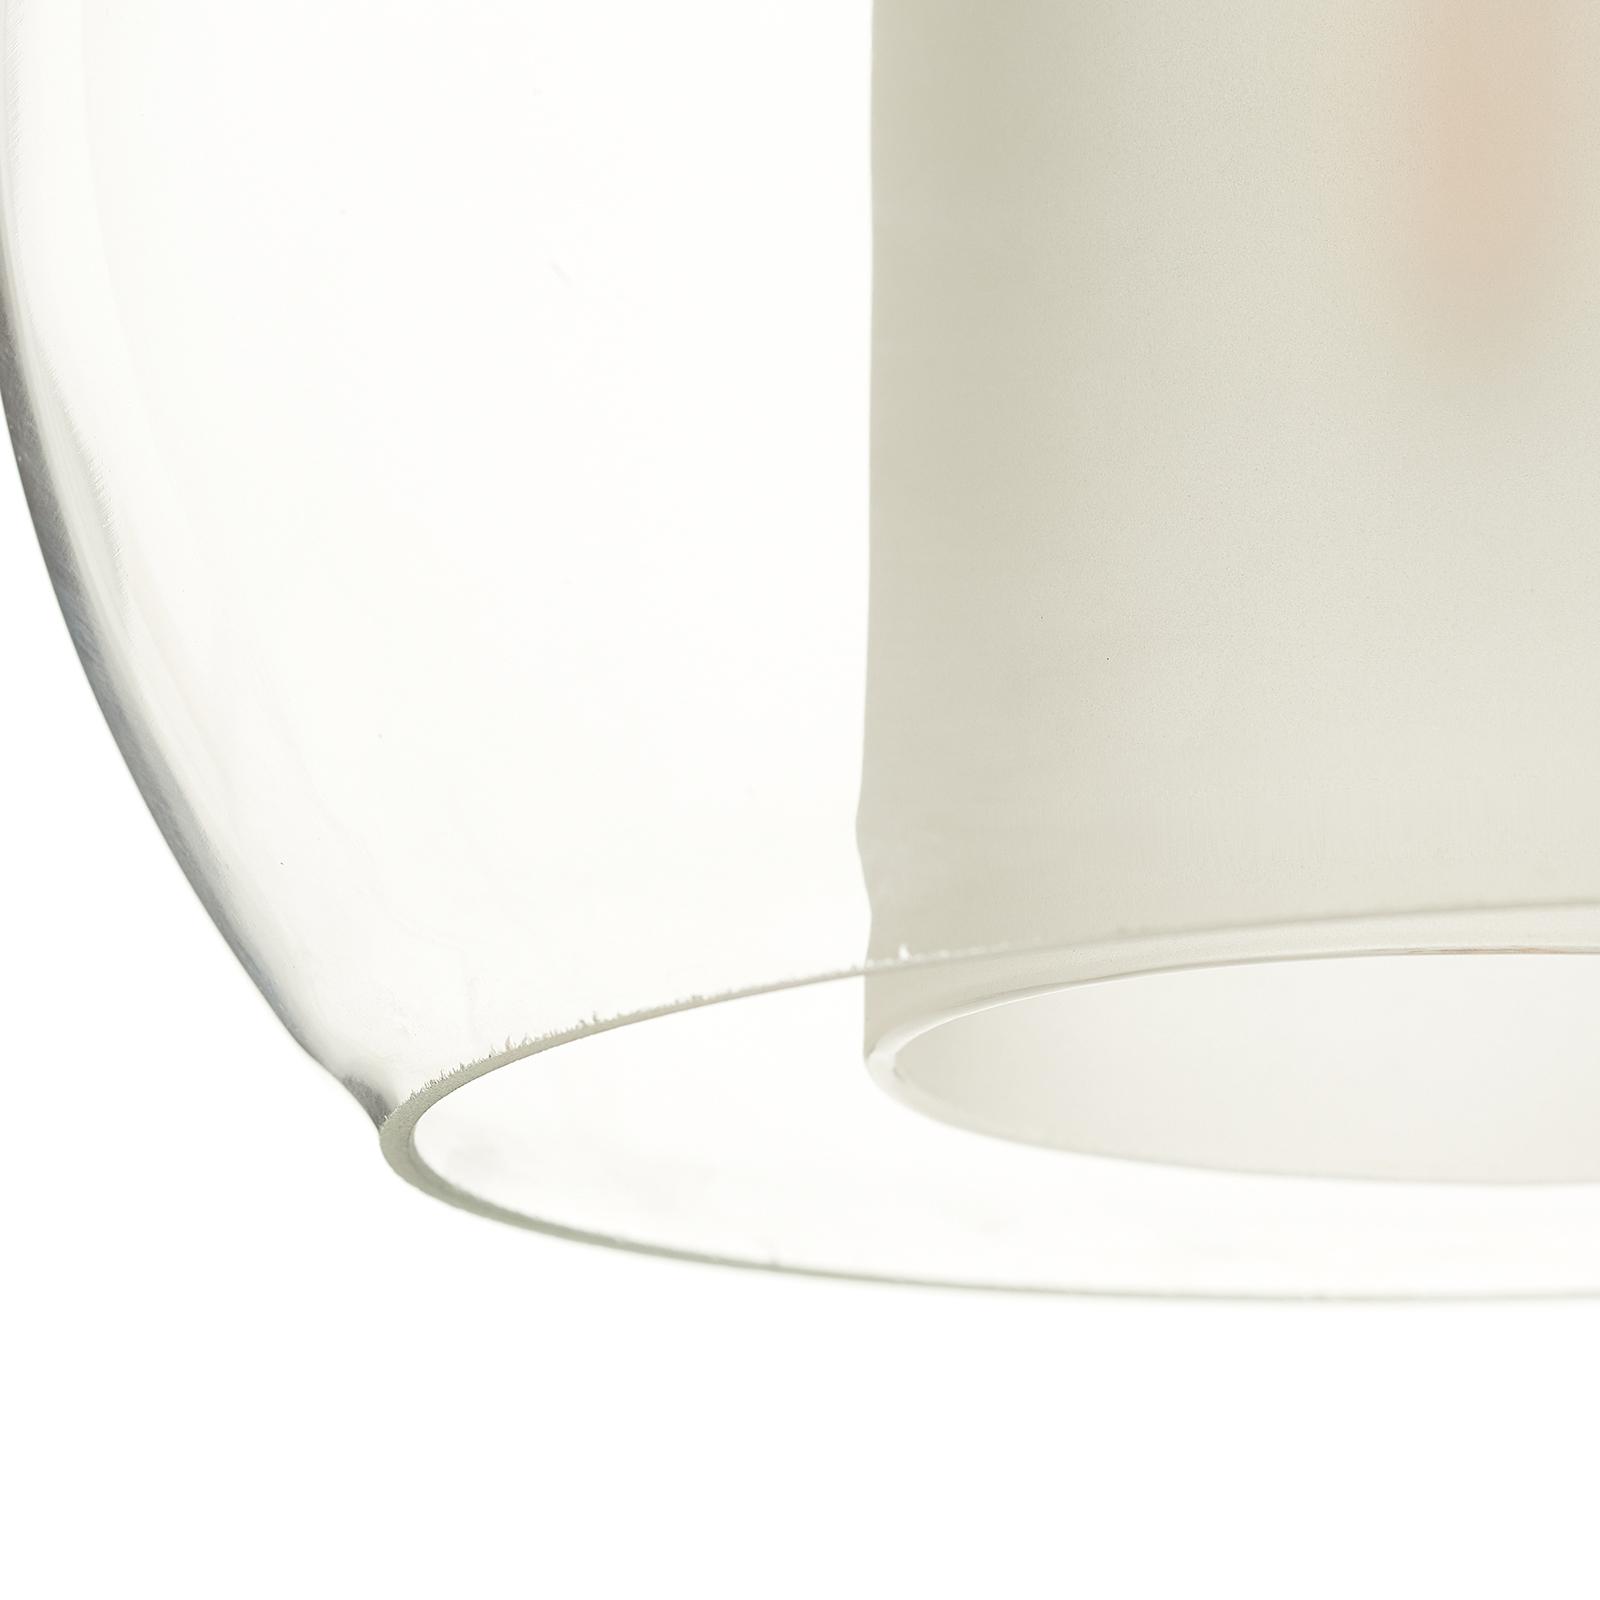 Edel glasspendellampe Bolsano | Lampegiganten.no